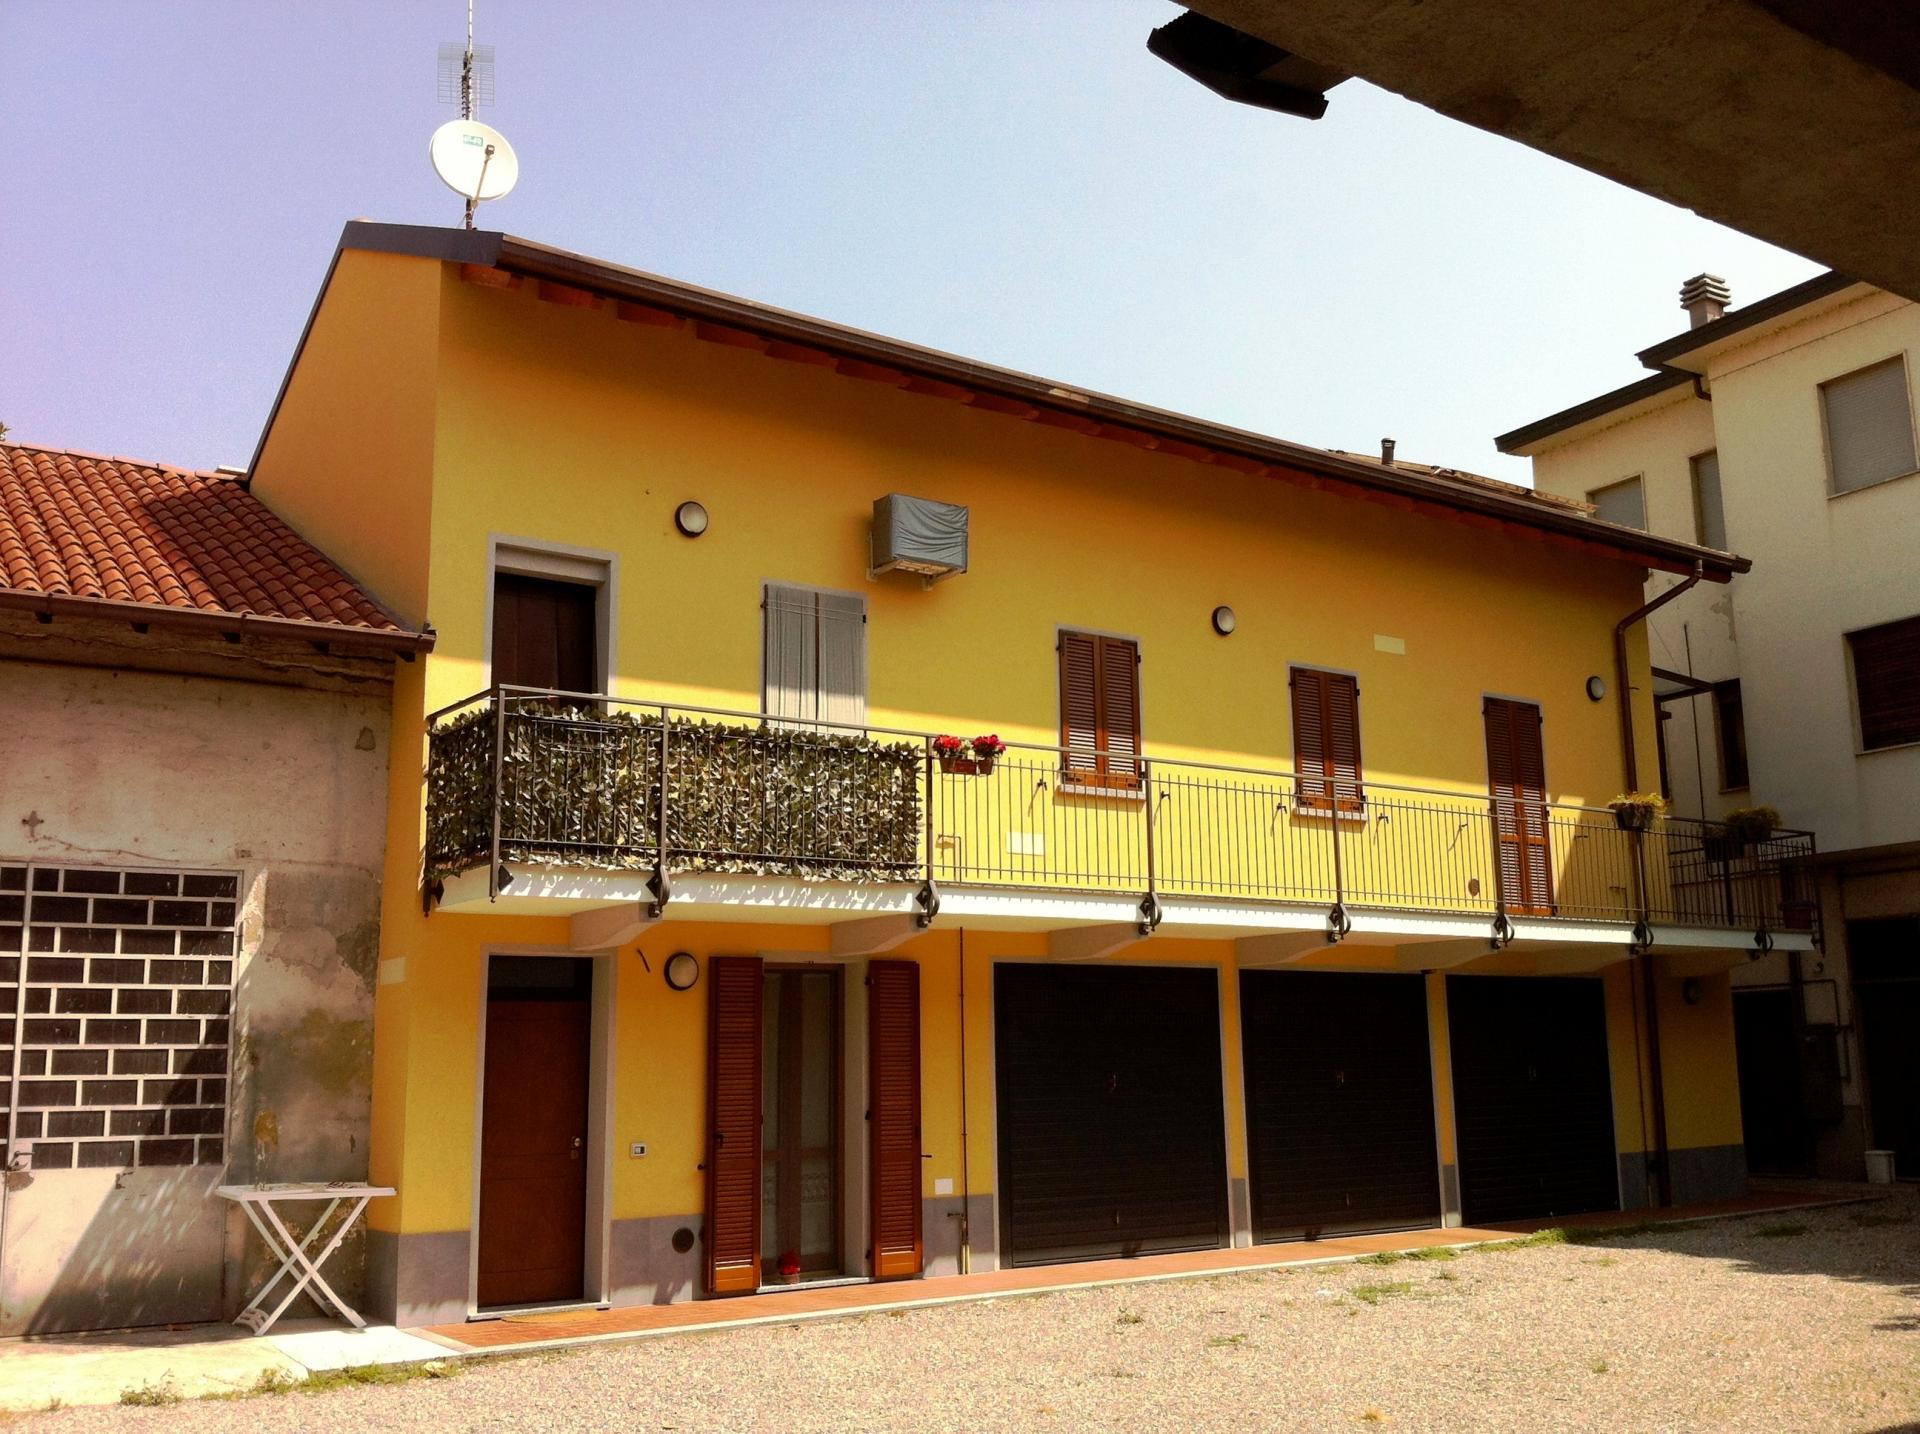 Bilocale Melzo Via Giacomo Matteotti 3